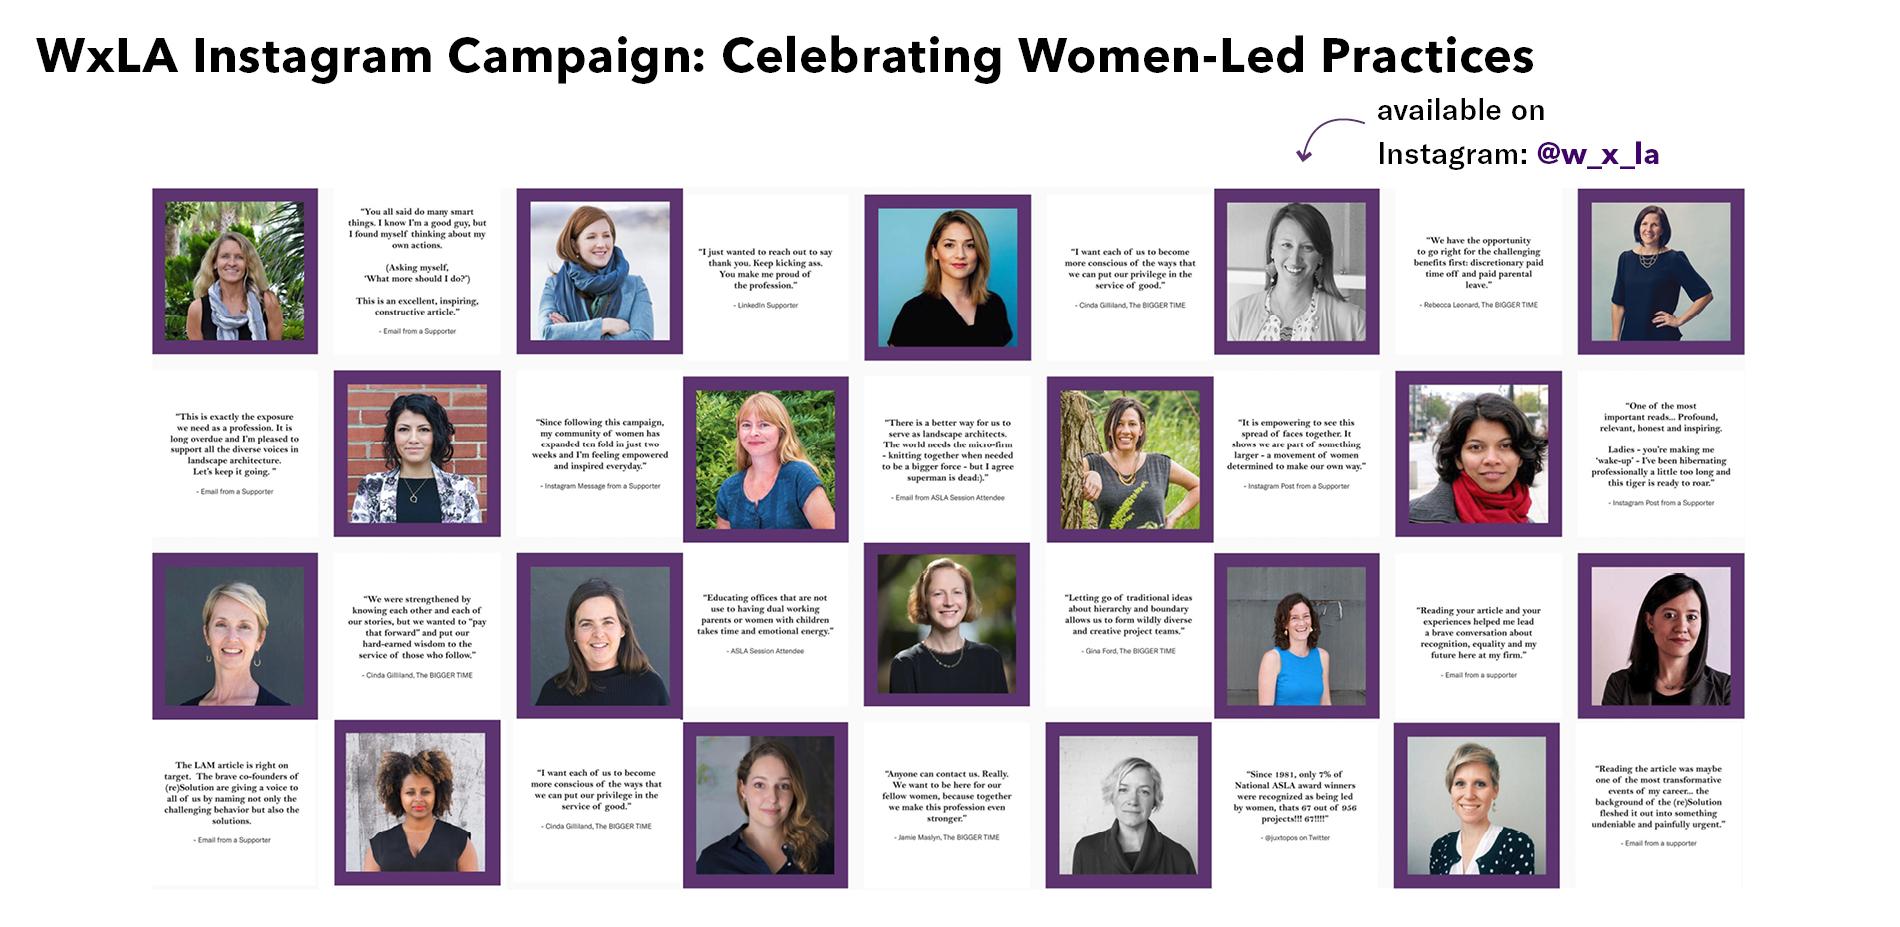 WxLA Instagram Campaign: Celebrating Women-led Practices